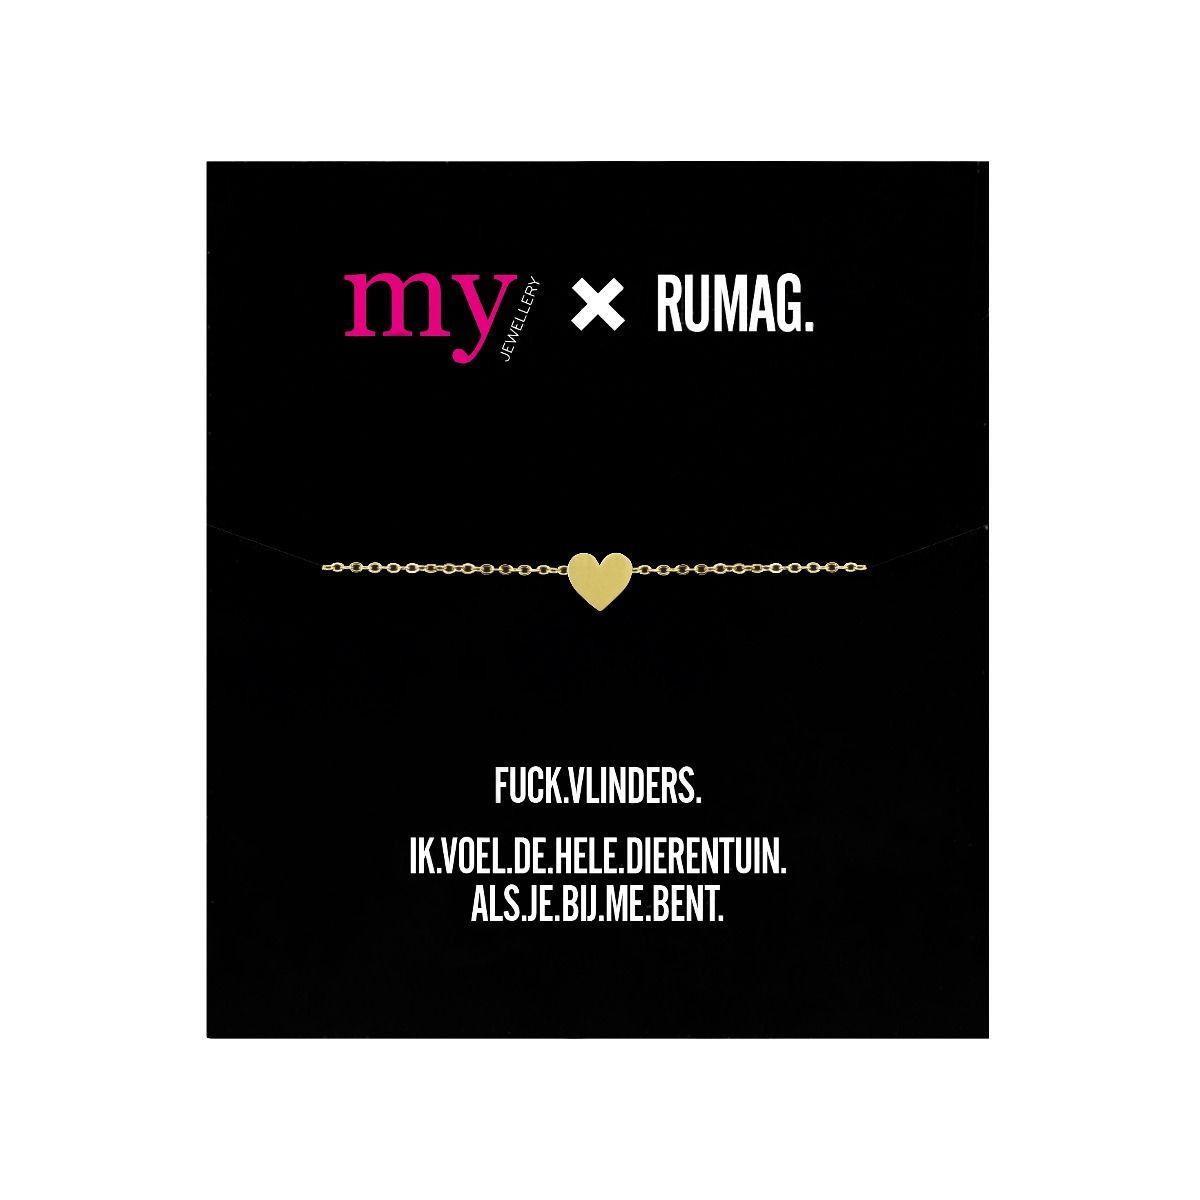 my jewellery x rumag